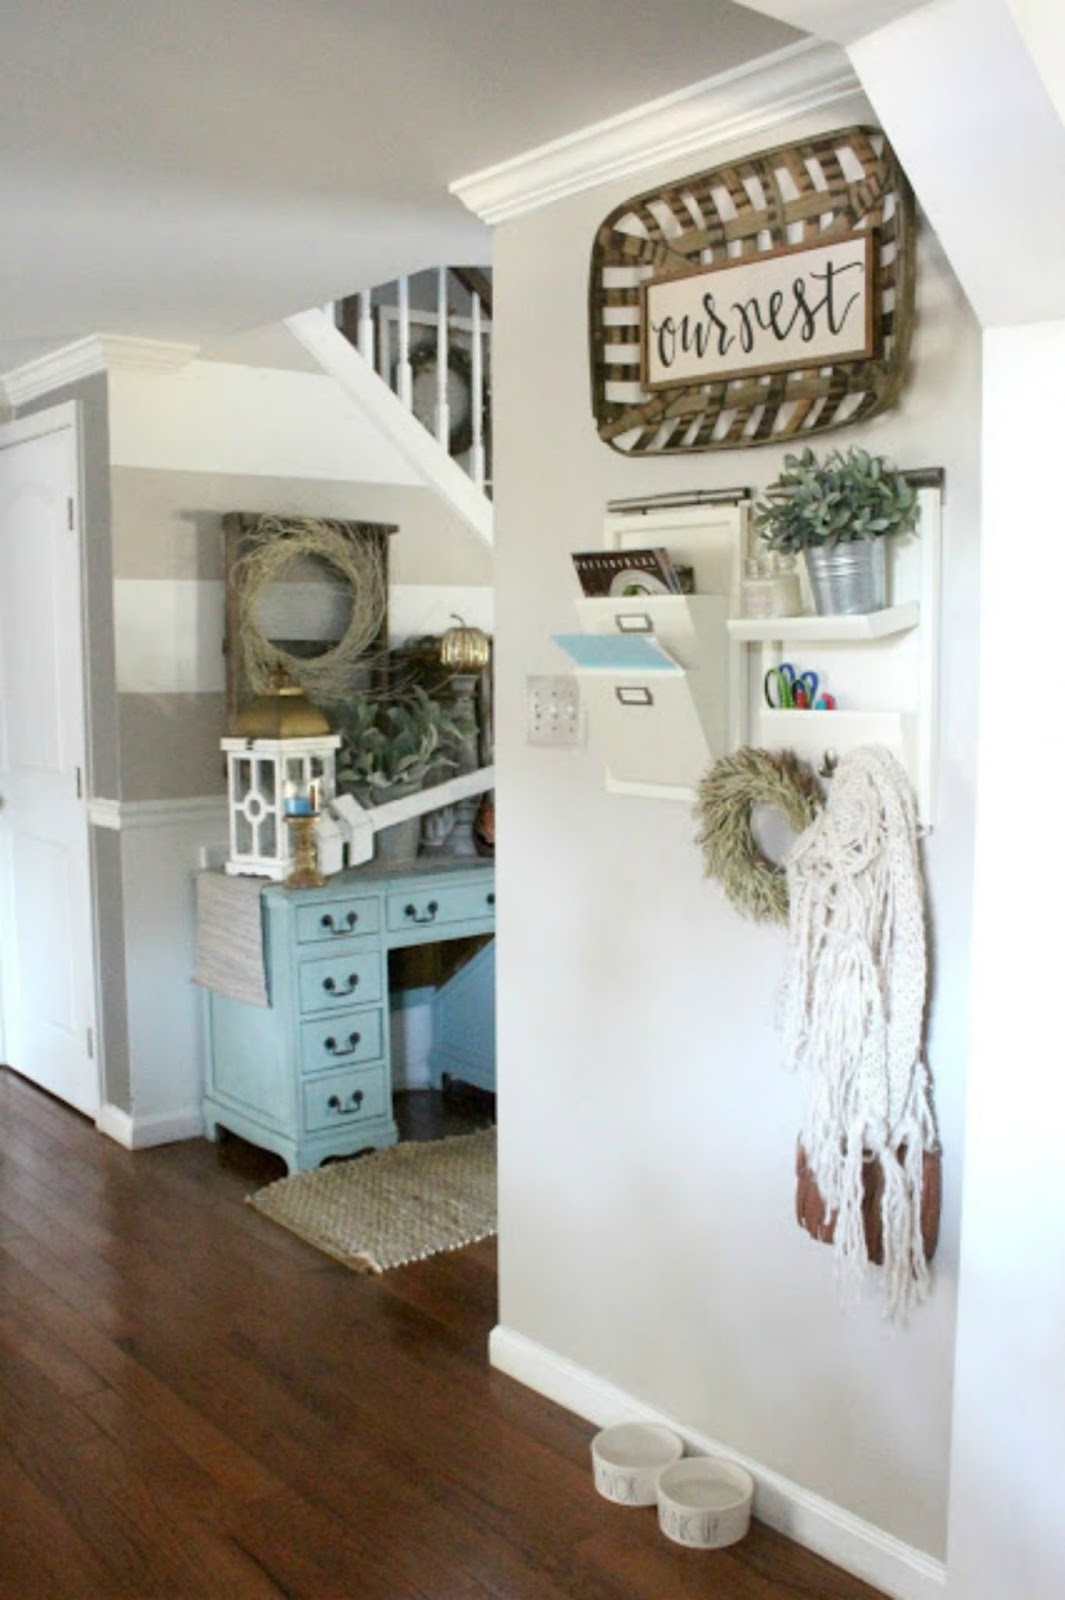 The BEST Neutral Paint Color! - The Glam Farmhouse